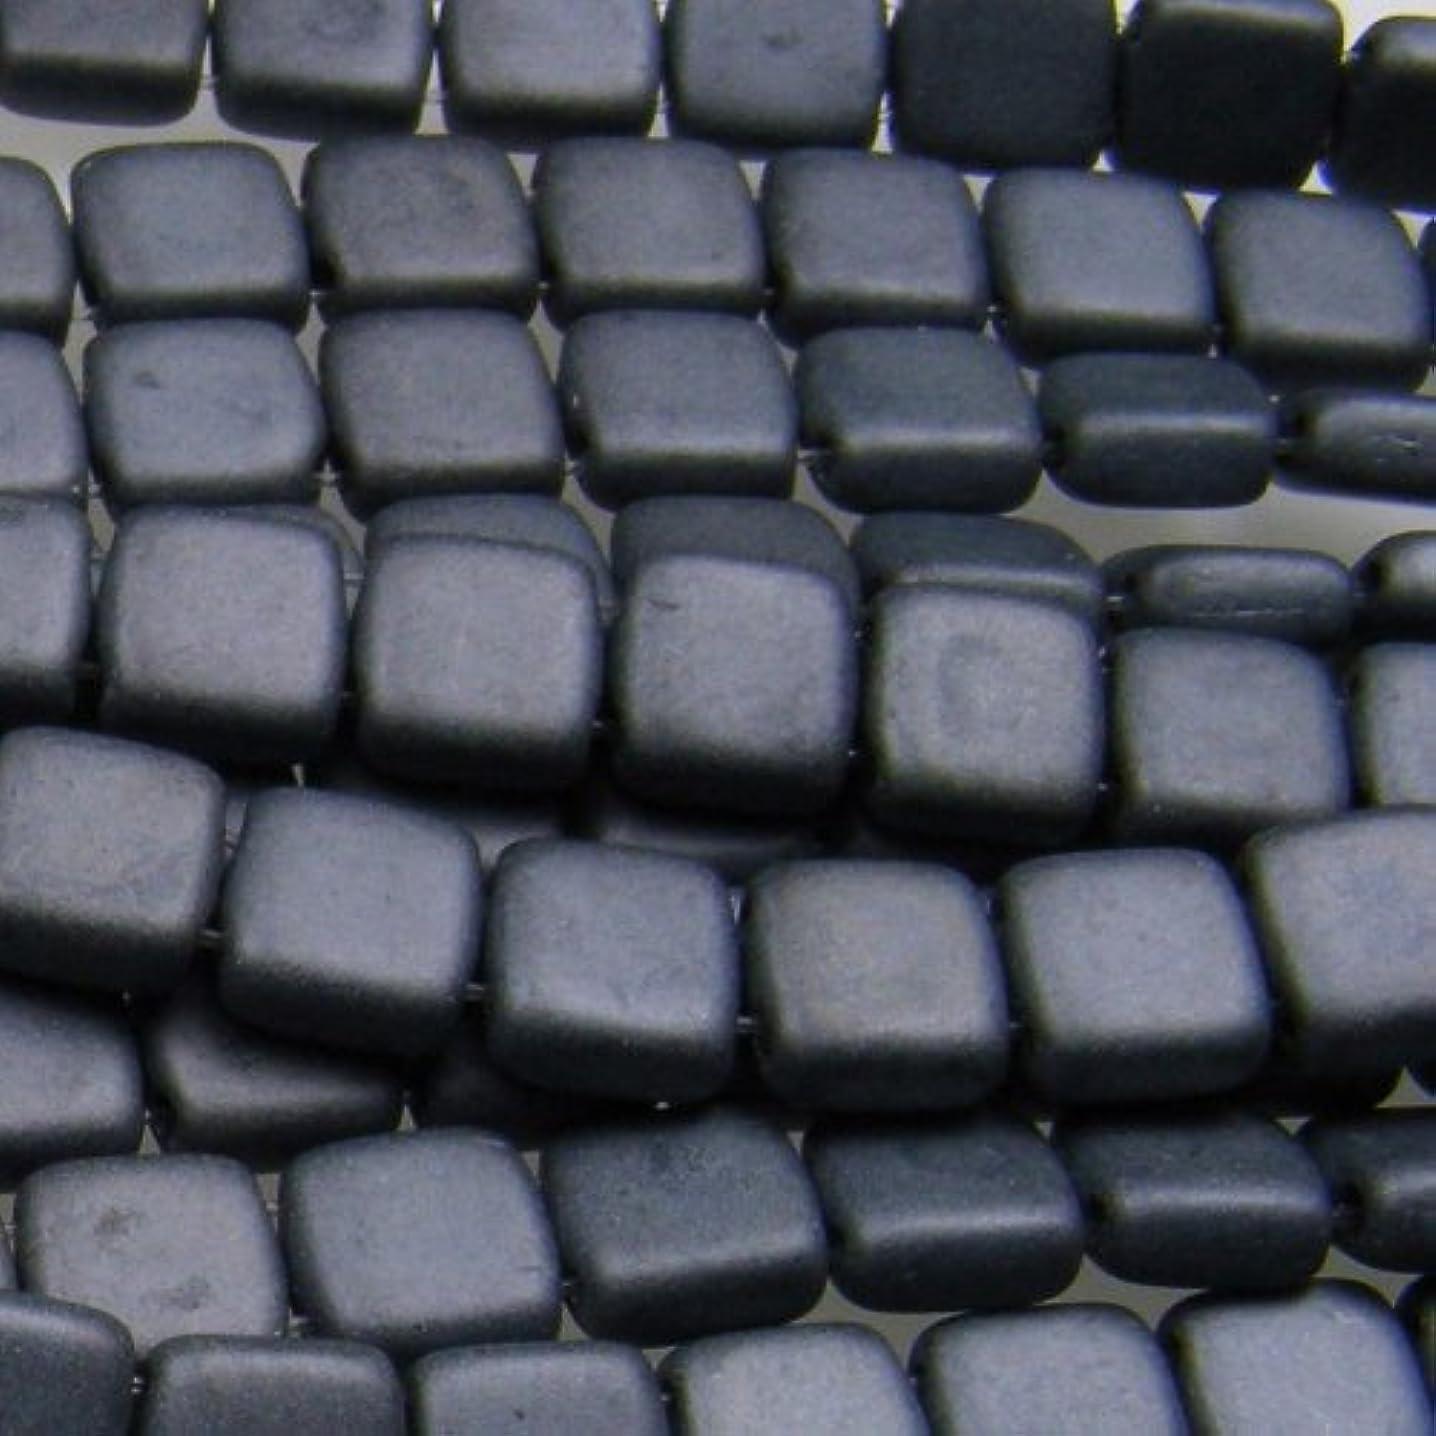 Czechmate 6mm Square Glass Czech Two Hole Tile Bead - Matte Hematite